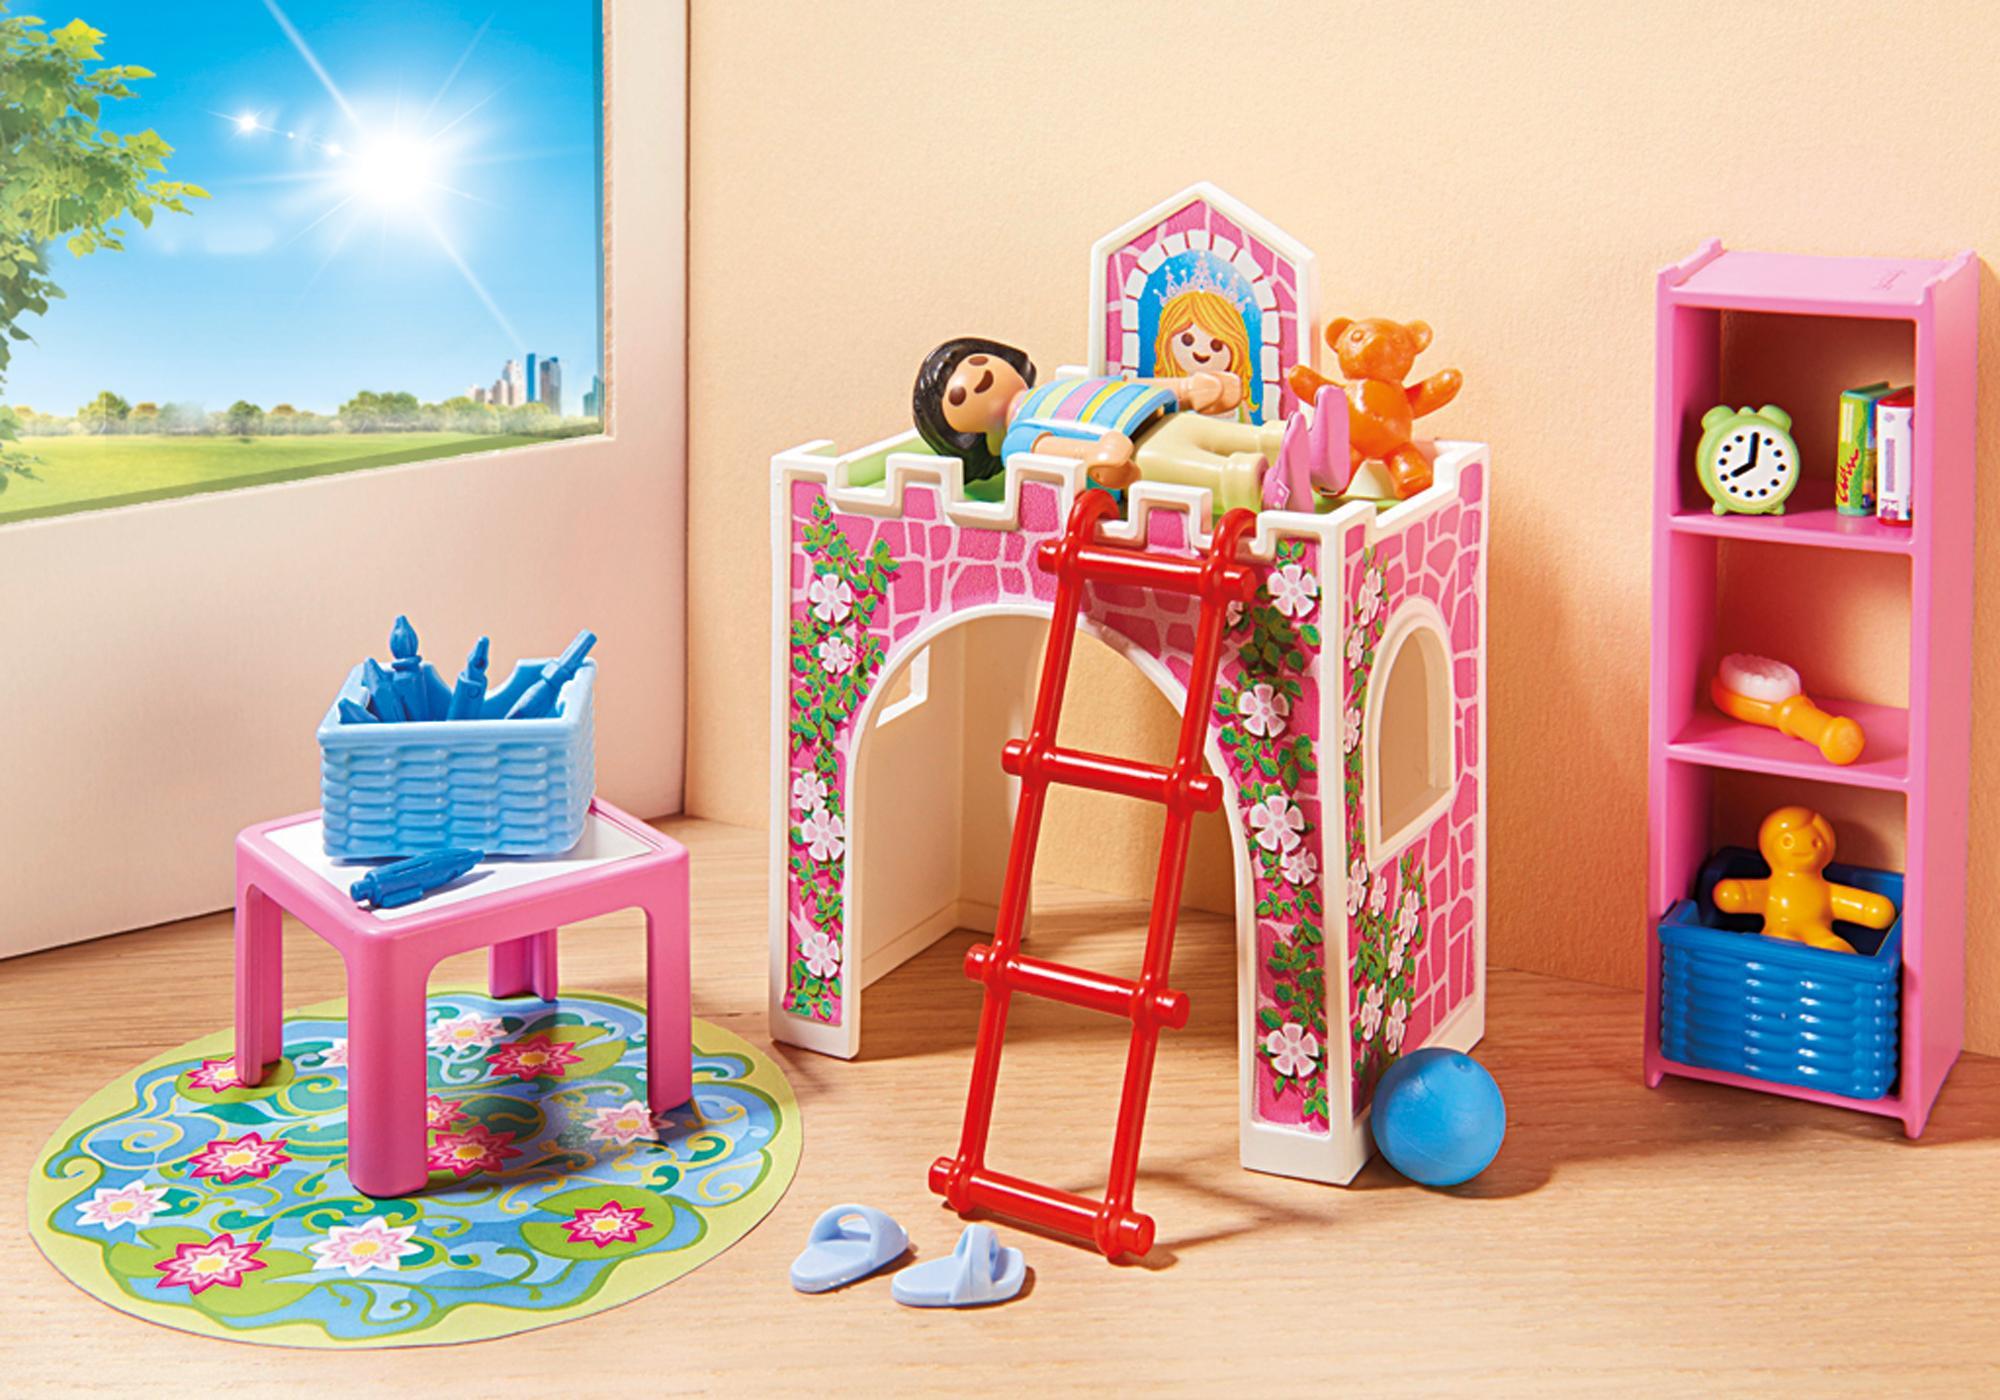 http://media.playmobil.com/i/playmobil/9270_product_extra1/Habitación Infantil